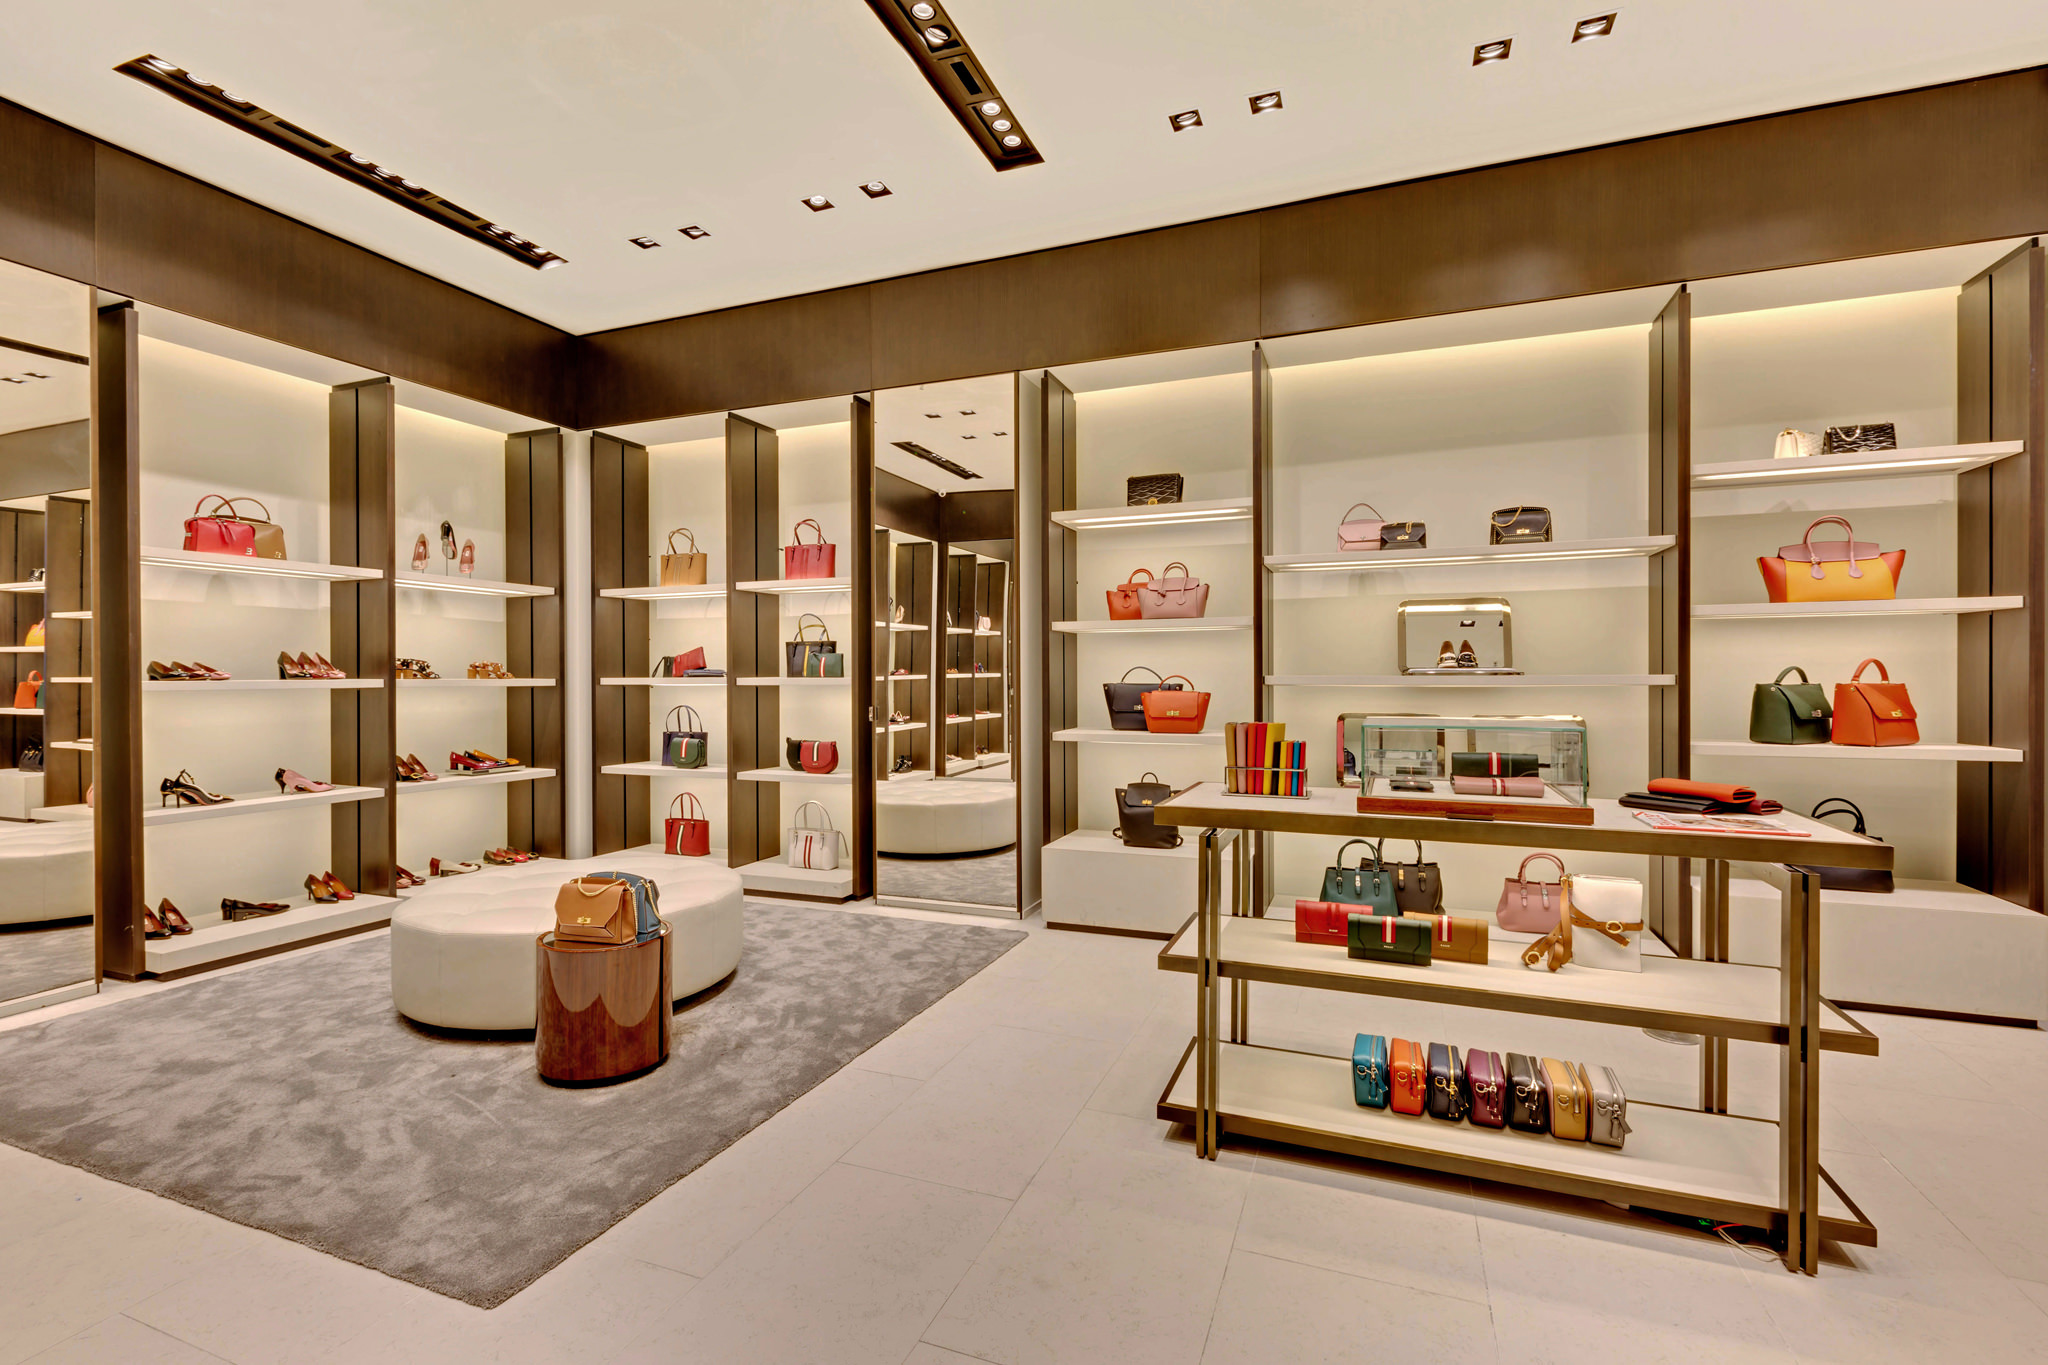 20170721 - Bally - HCM - Commercial - Interior - Store - Retouch 0017.jpg